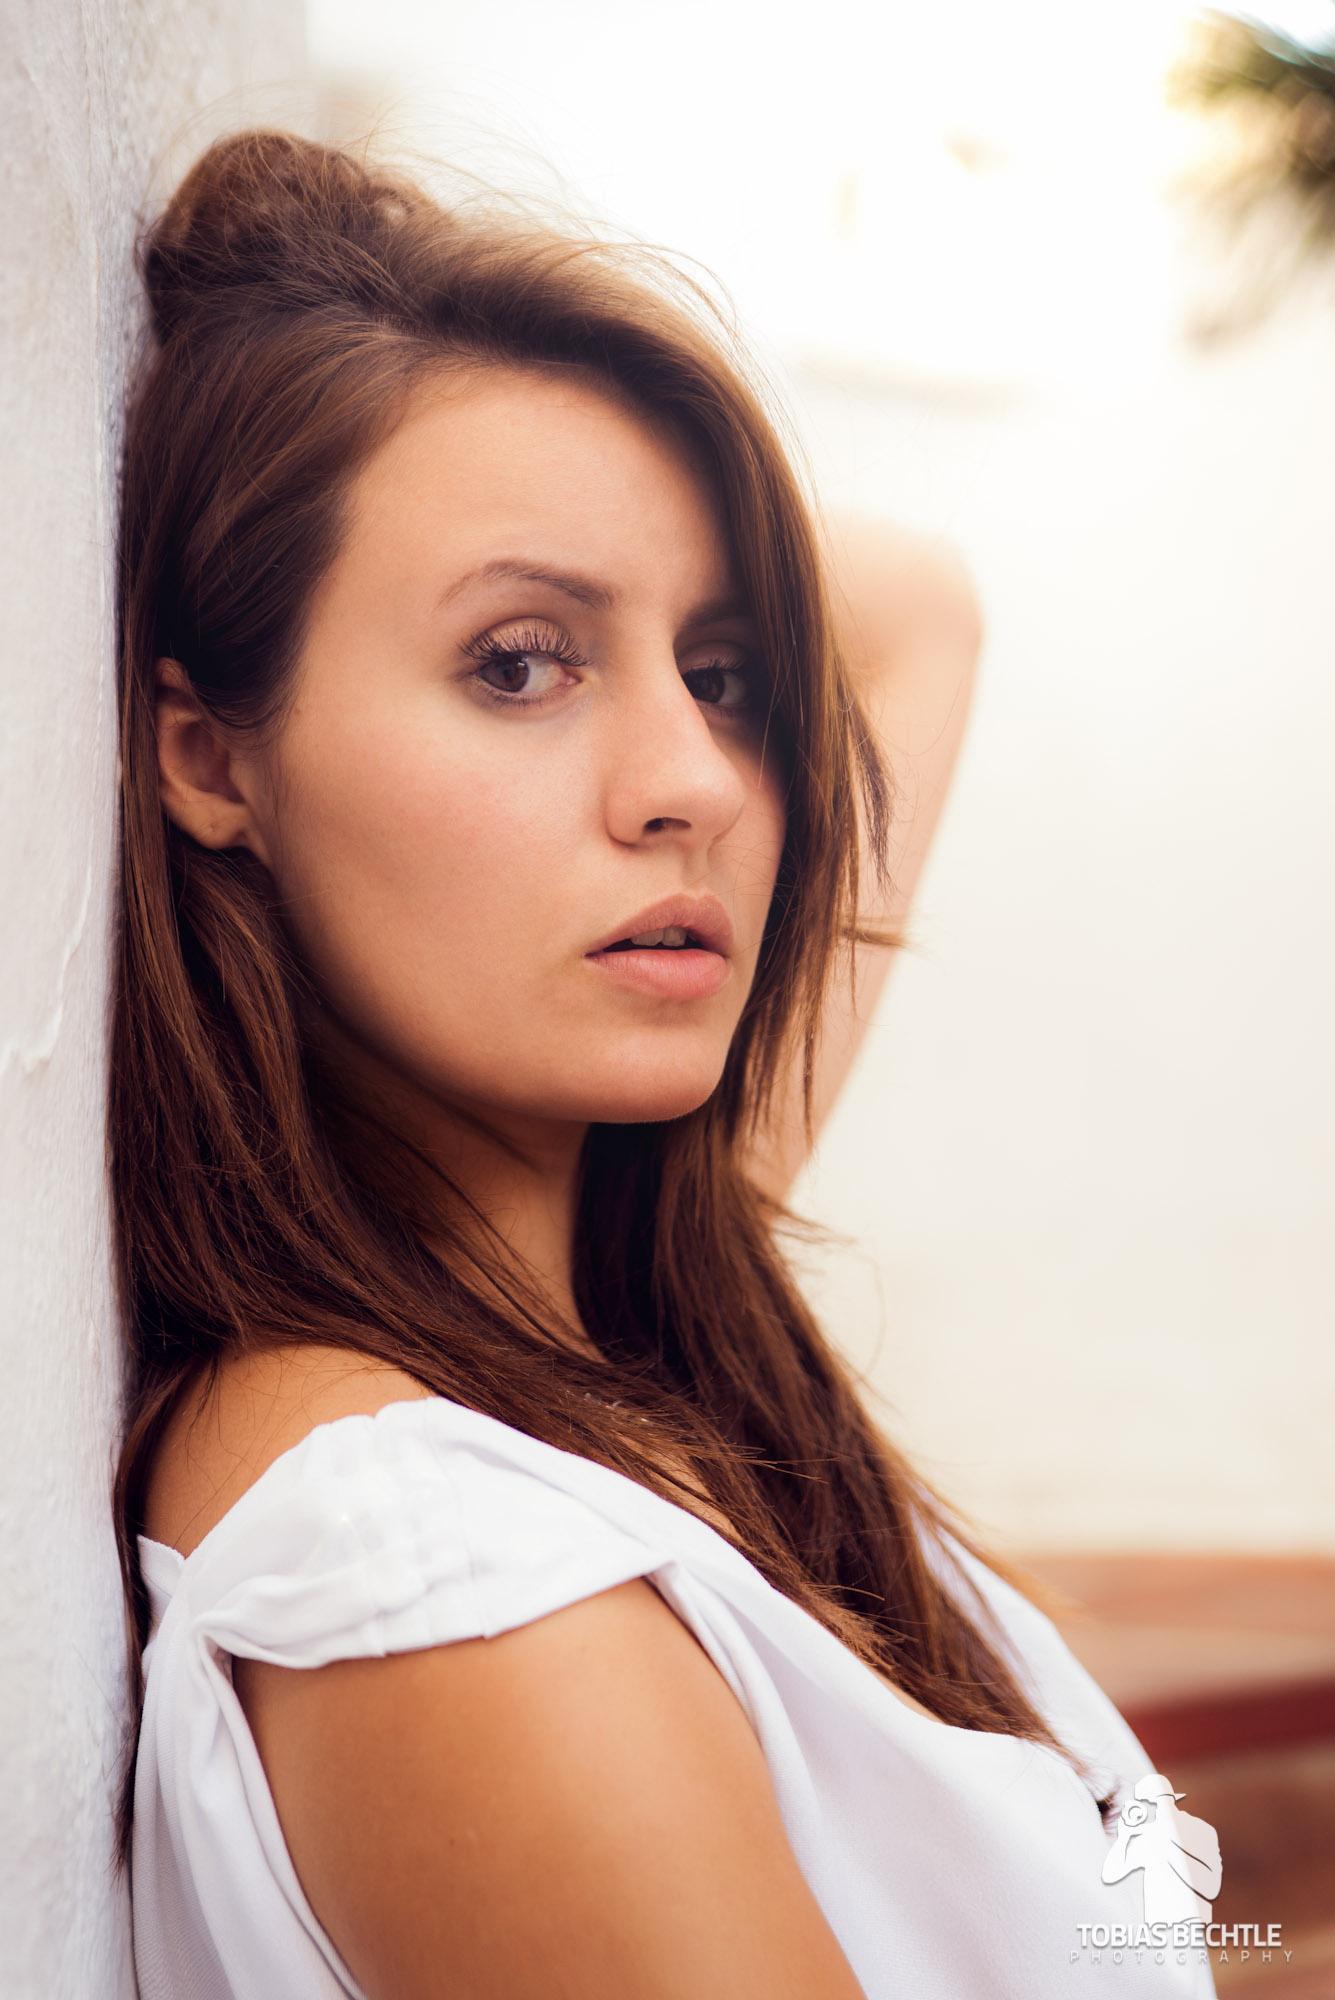 Lucy Malaga #2